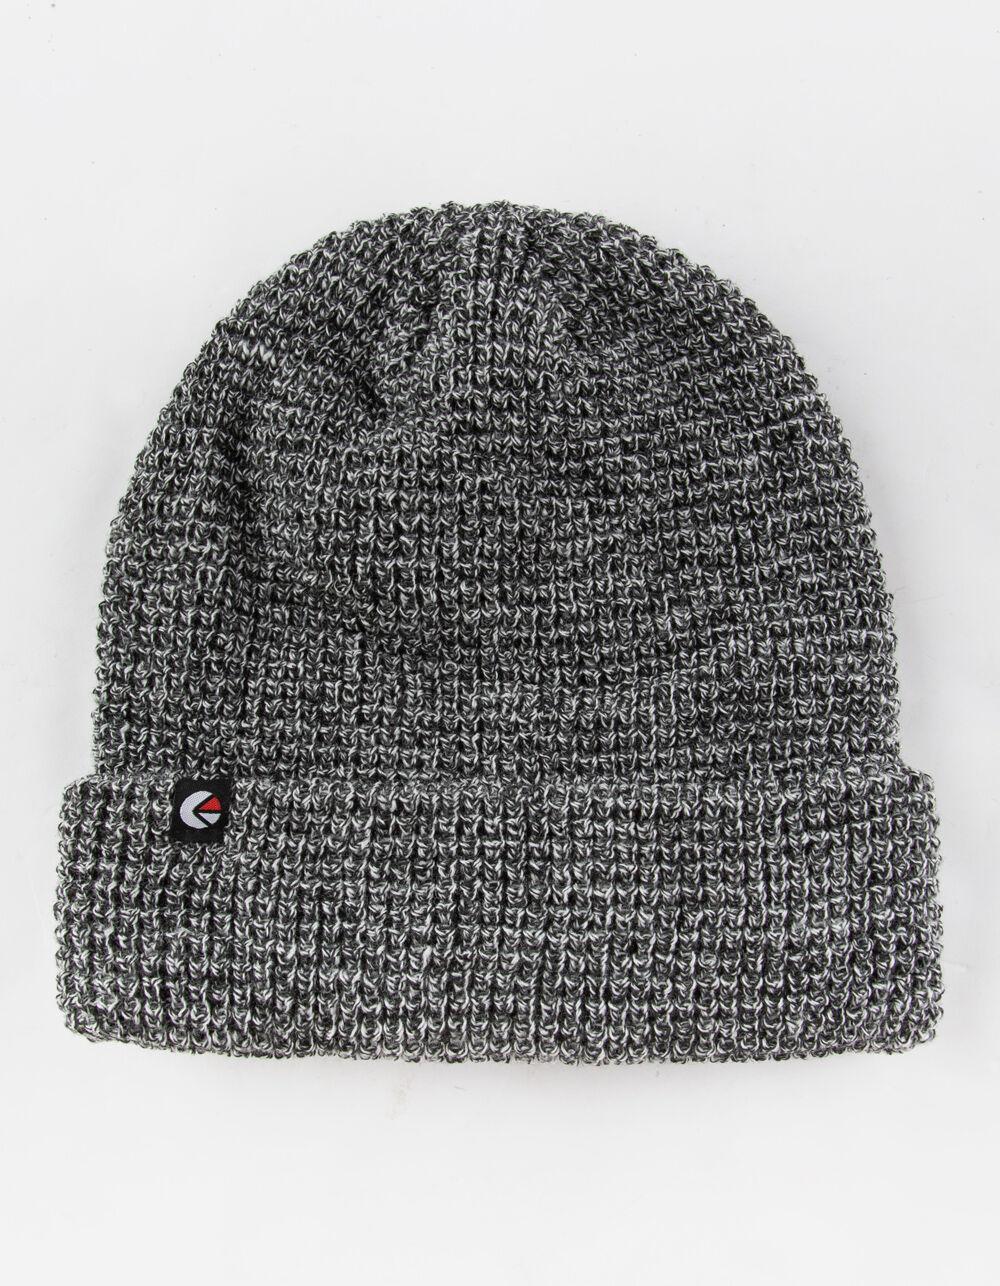 ETHIKA Thermal Knit Gray Beanie